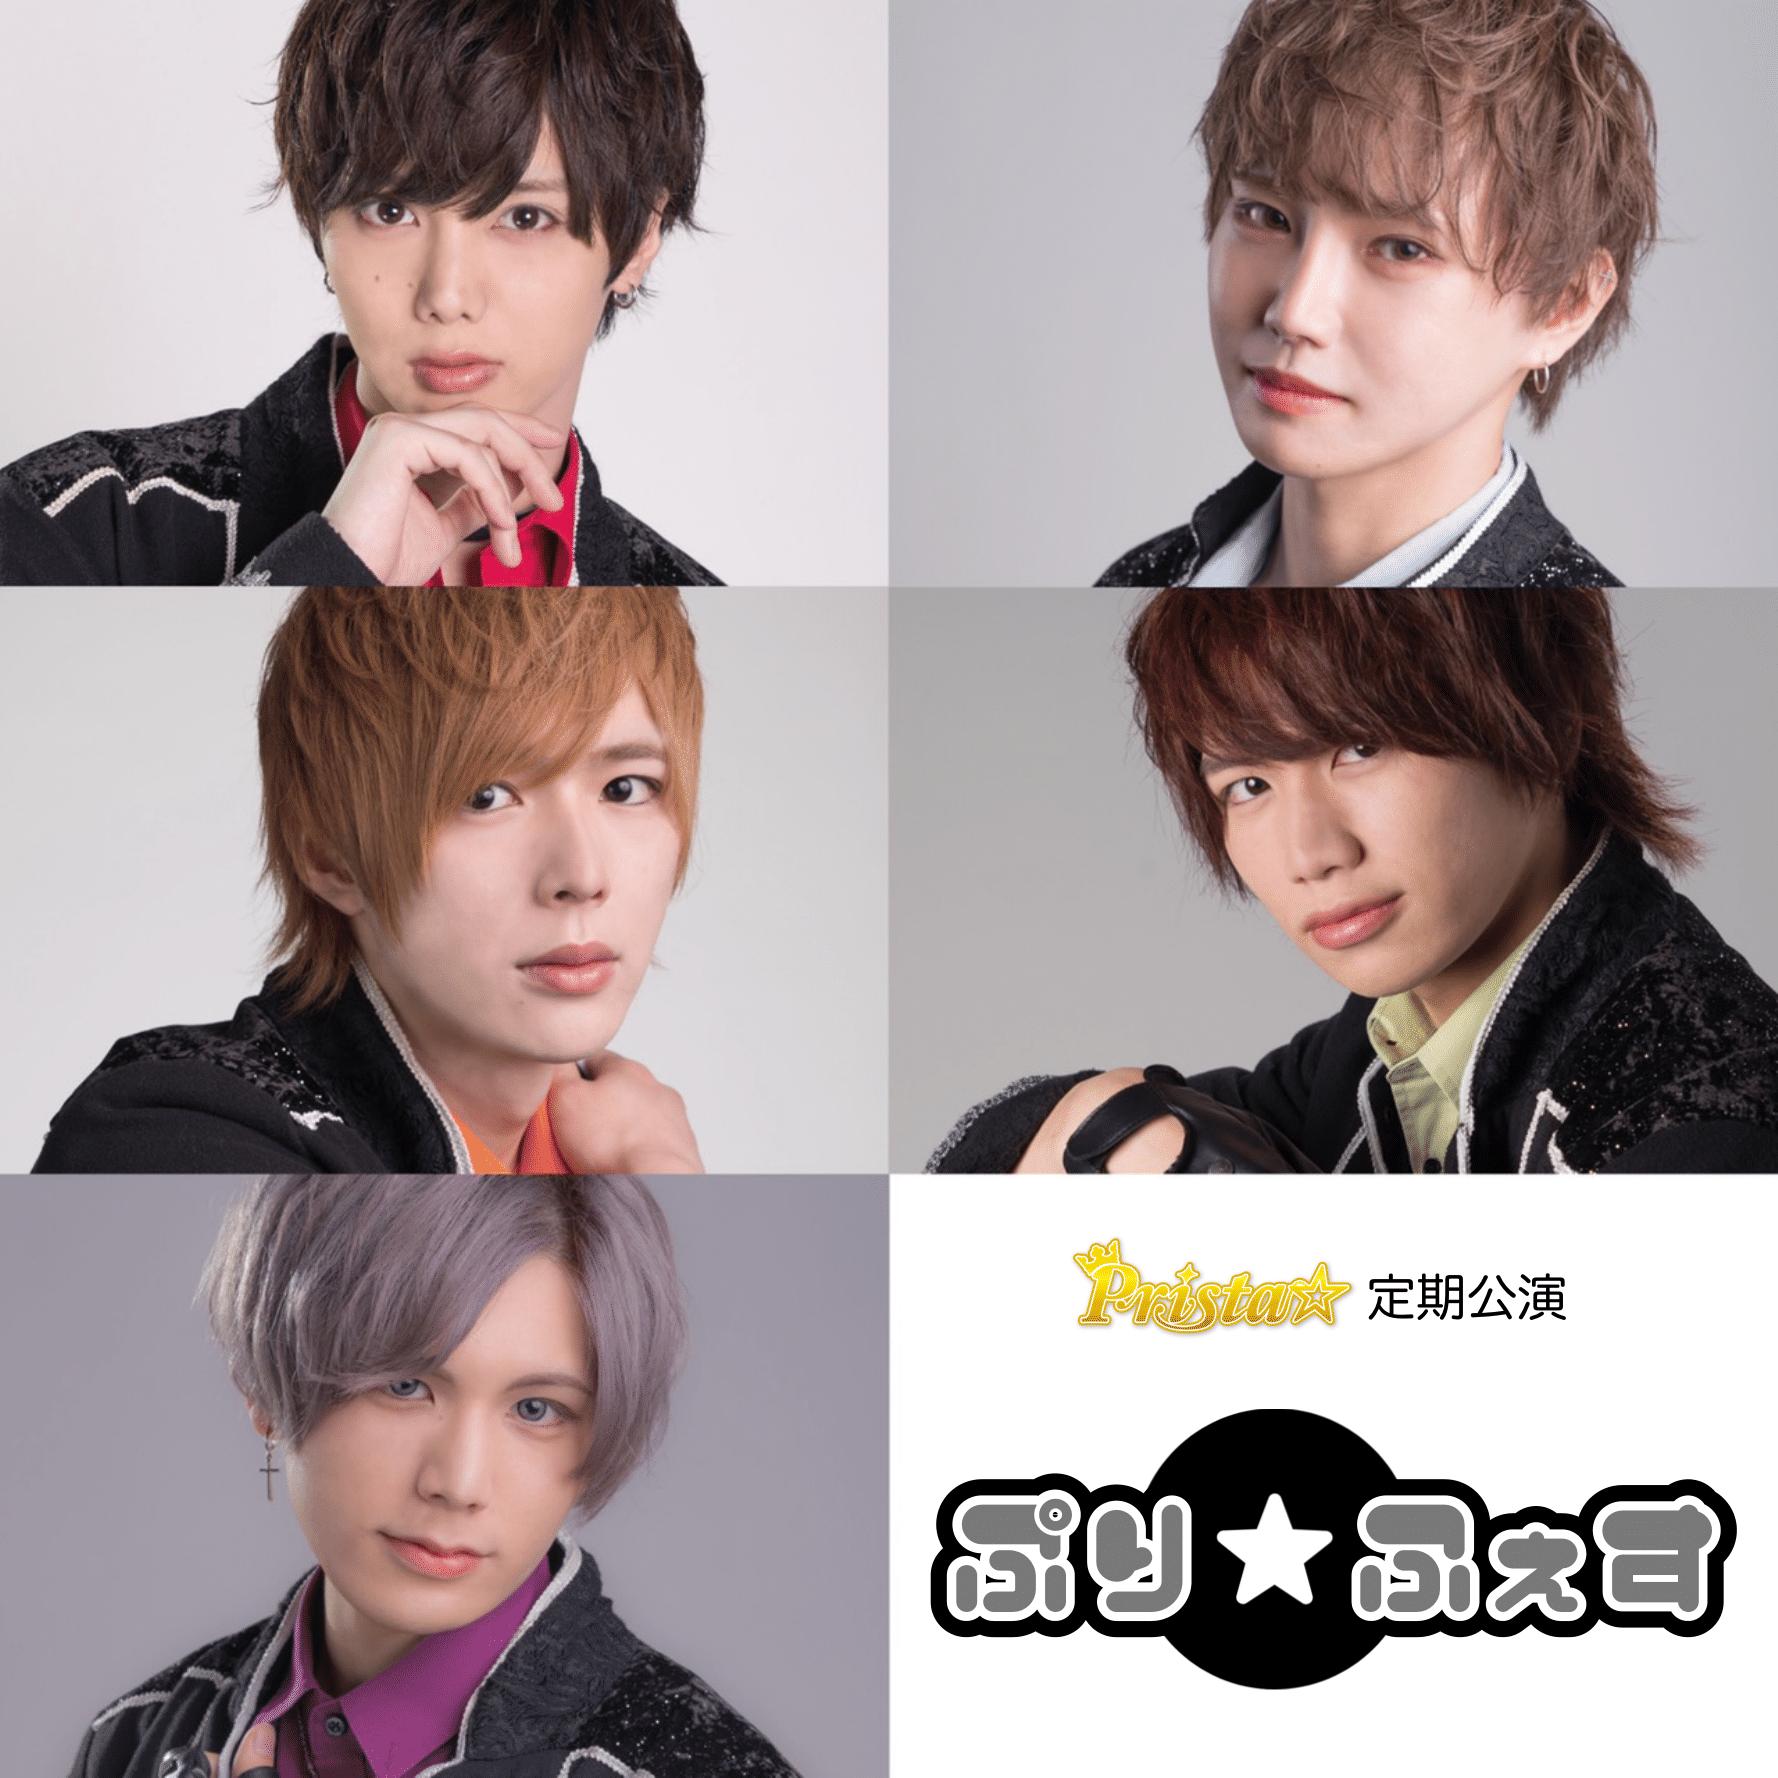 Prista☆定期公演「ぷり☆ふぇす」vol.11